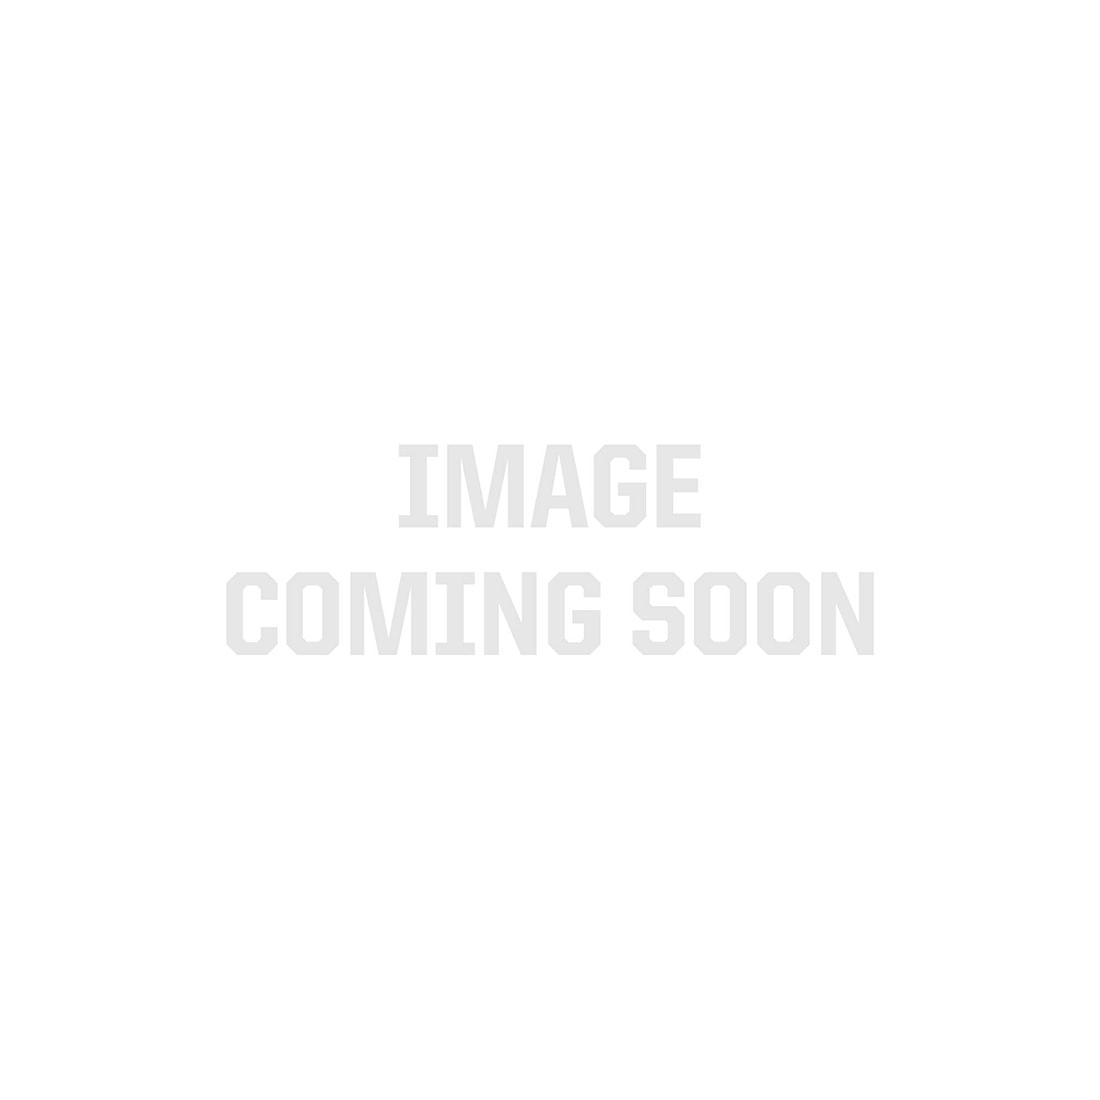 S14 Clear Glass Dimmable LED Light Bulb, E26 (Medium) Base, 1.4 watt (Warm White)